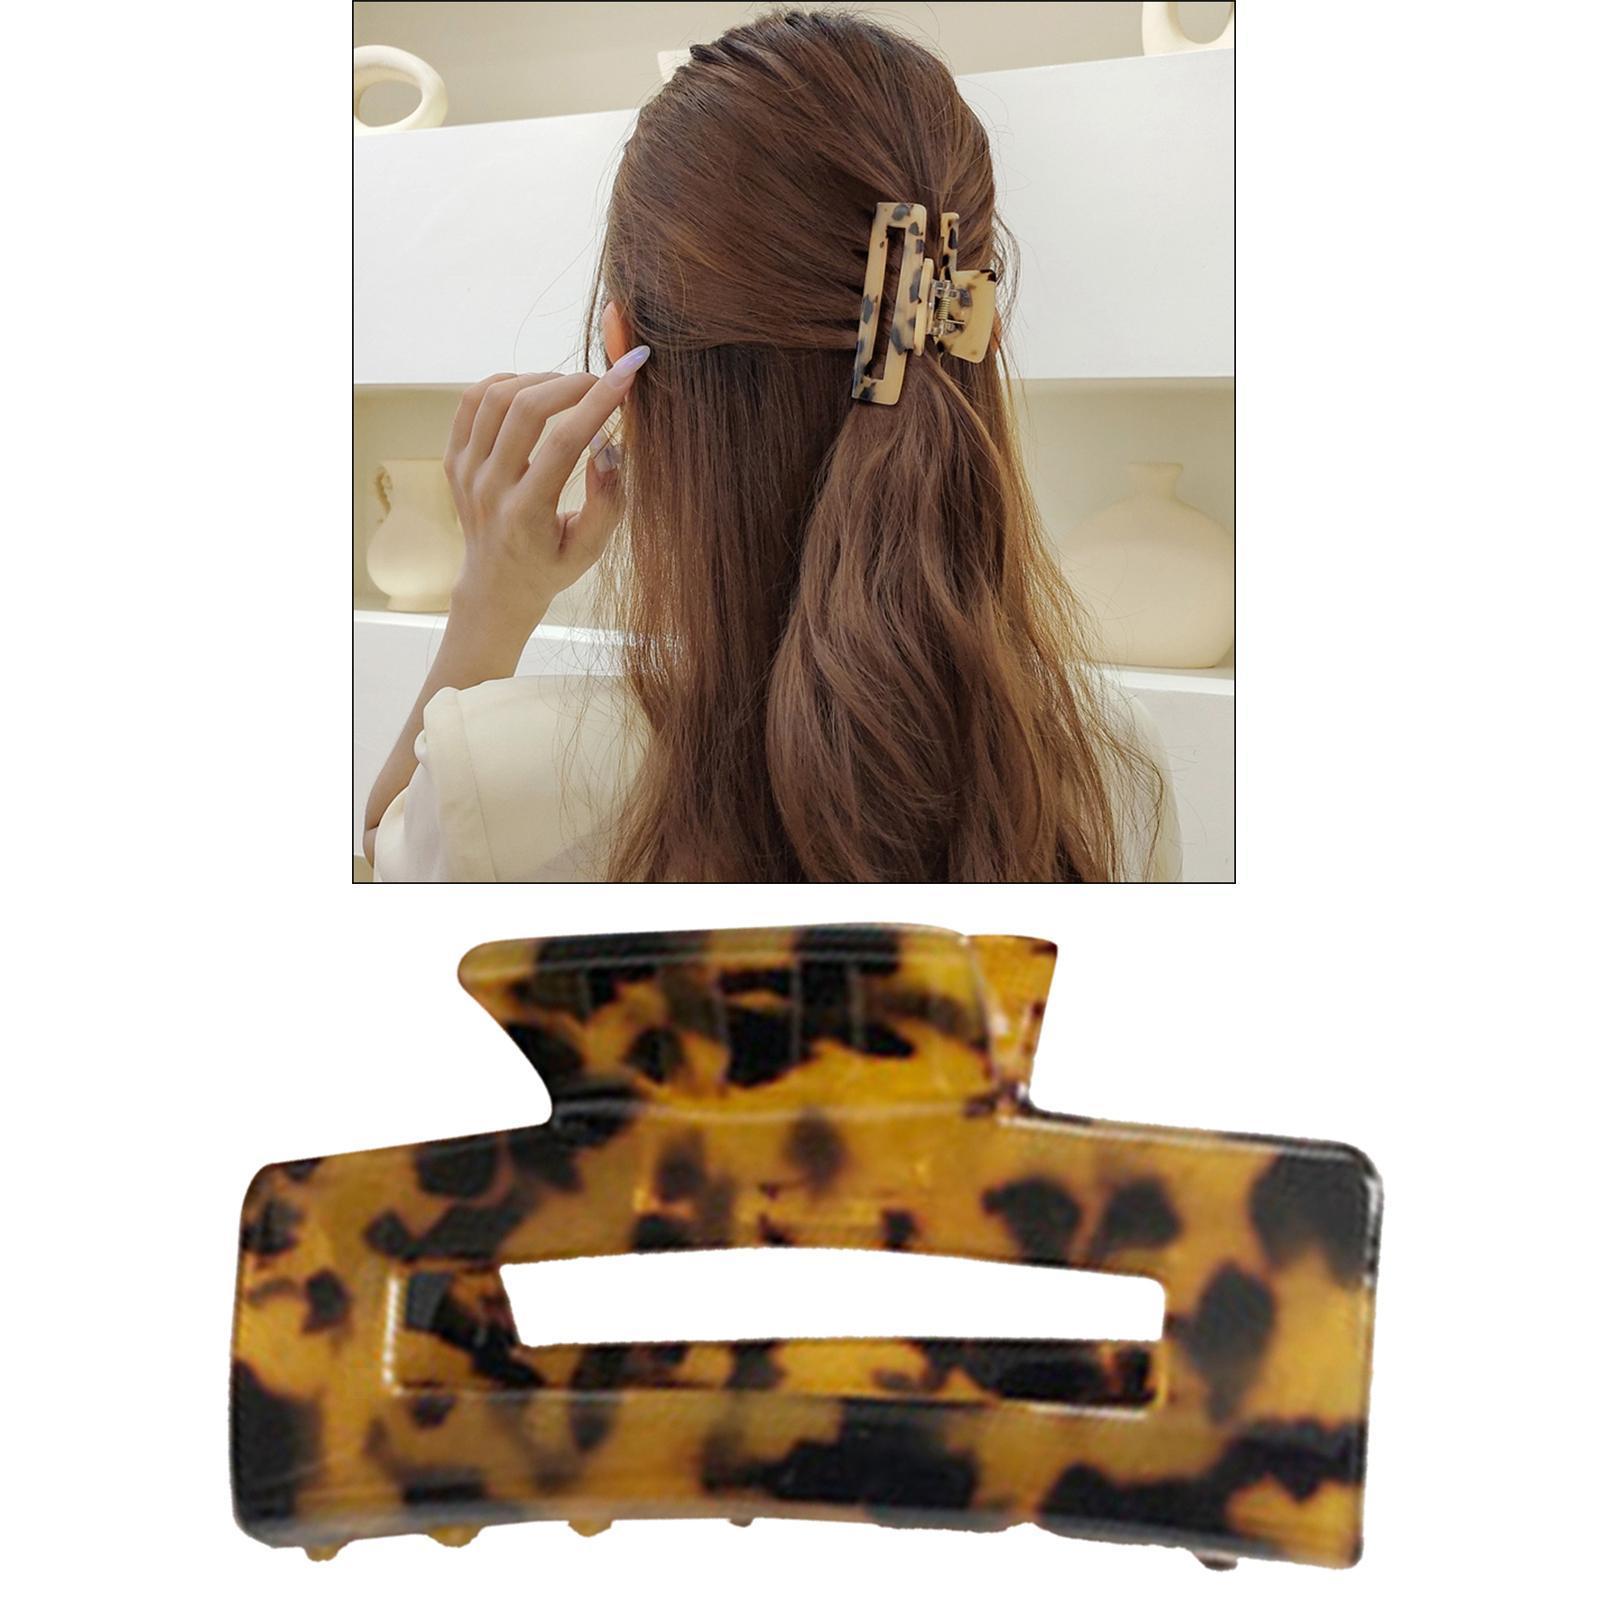 thumbnail 24 - Large Hair Clip Claws Rectangle Hair Jaw Hairpins Grip for Women Thick Hair